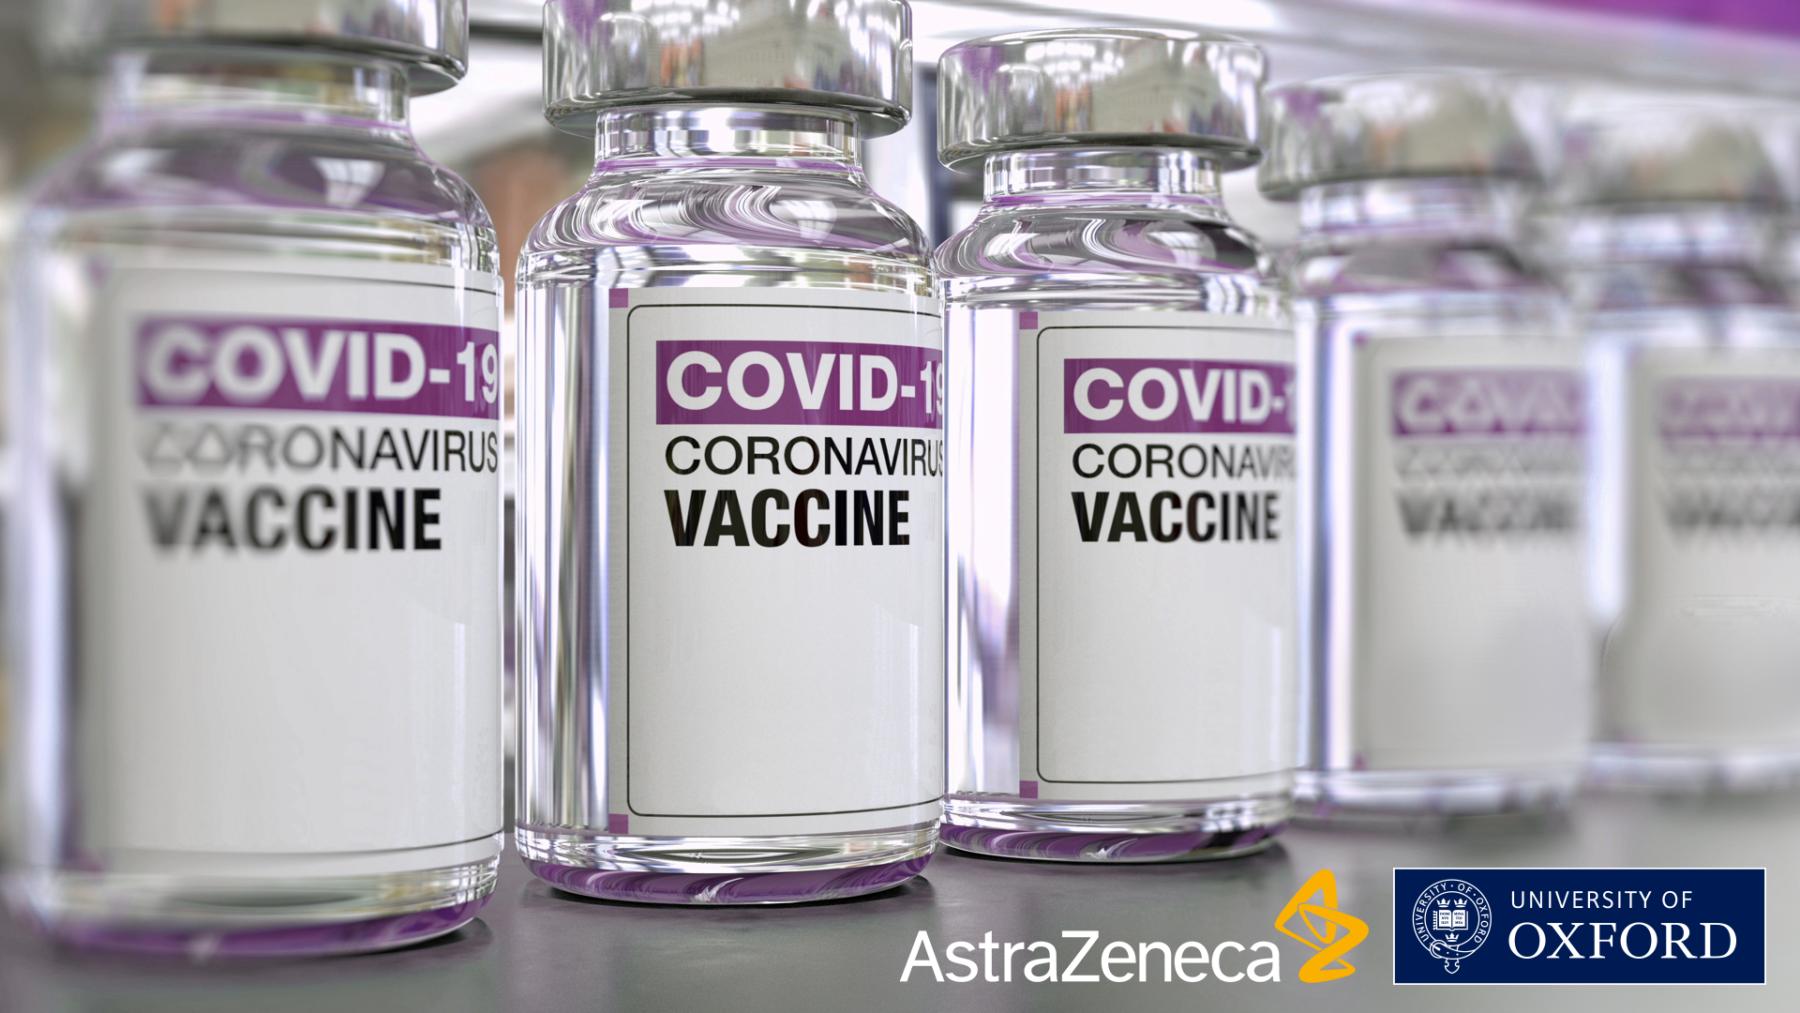 COVID-19 Vaccine AstraZeneca